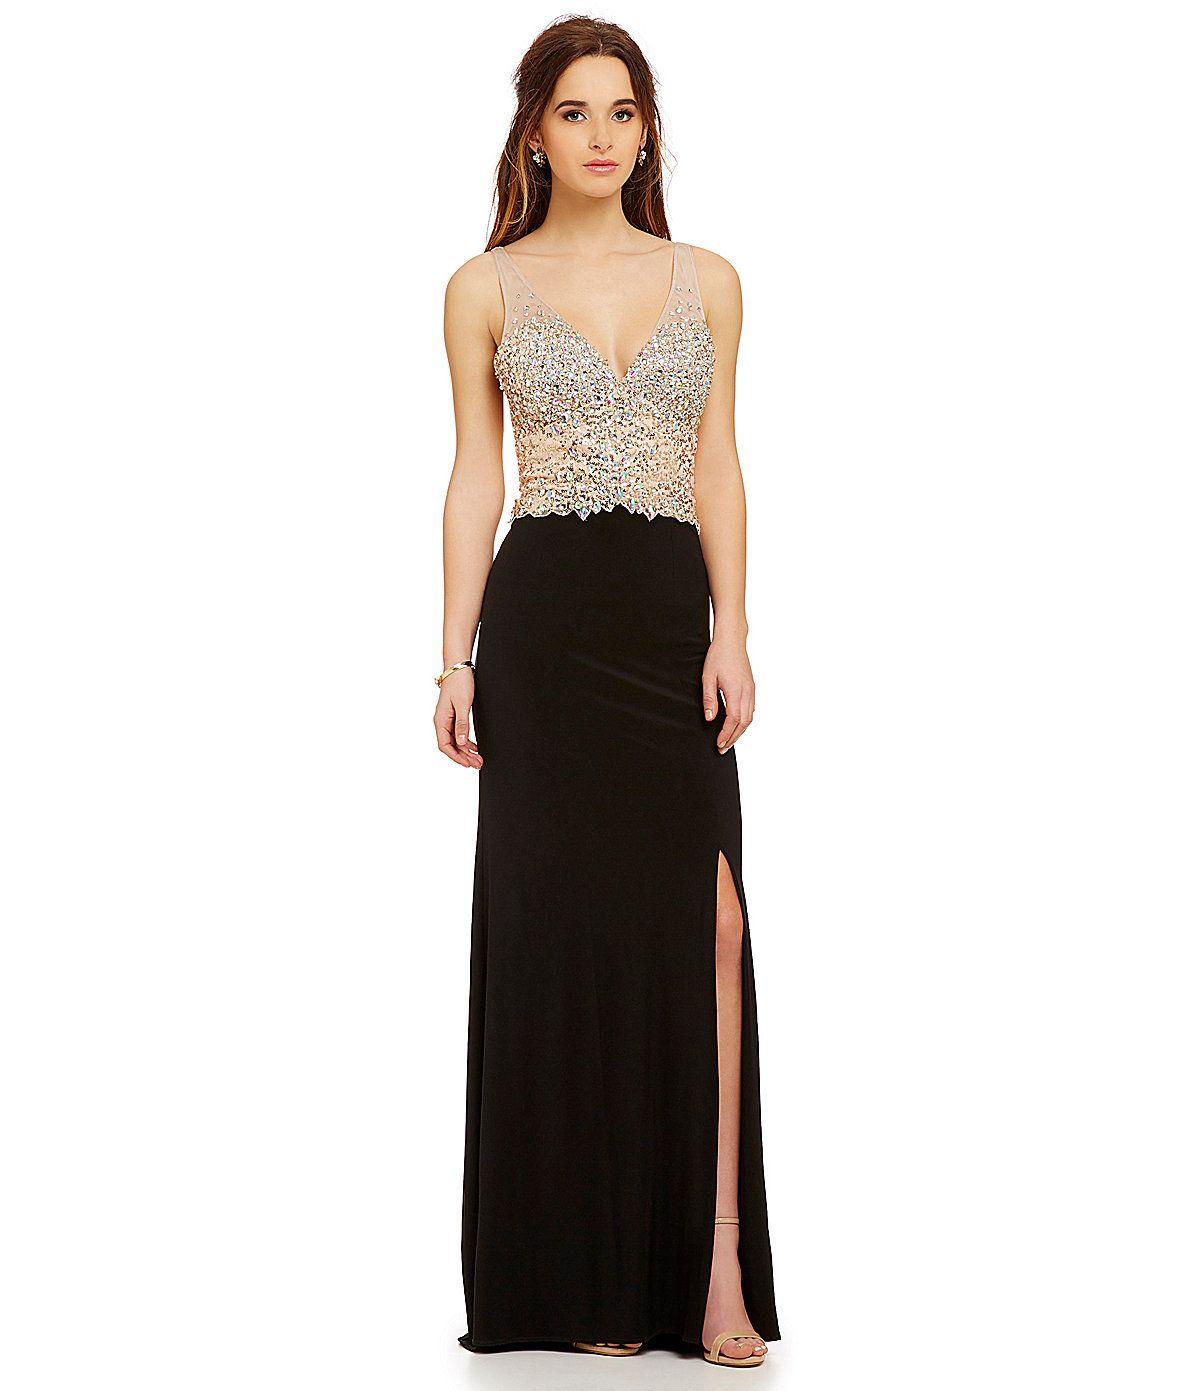 Morgan & Co. Double V-Neck Illusion Beaded Dress | Dillards.com ...